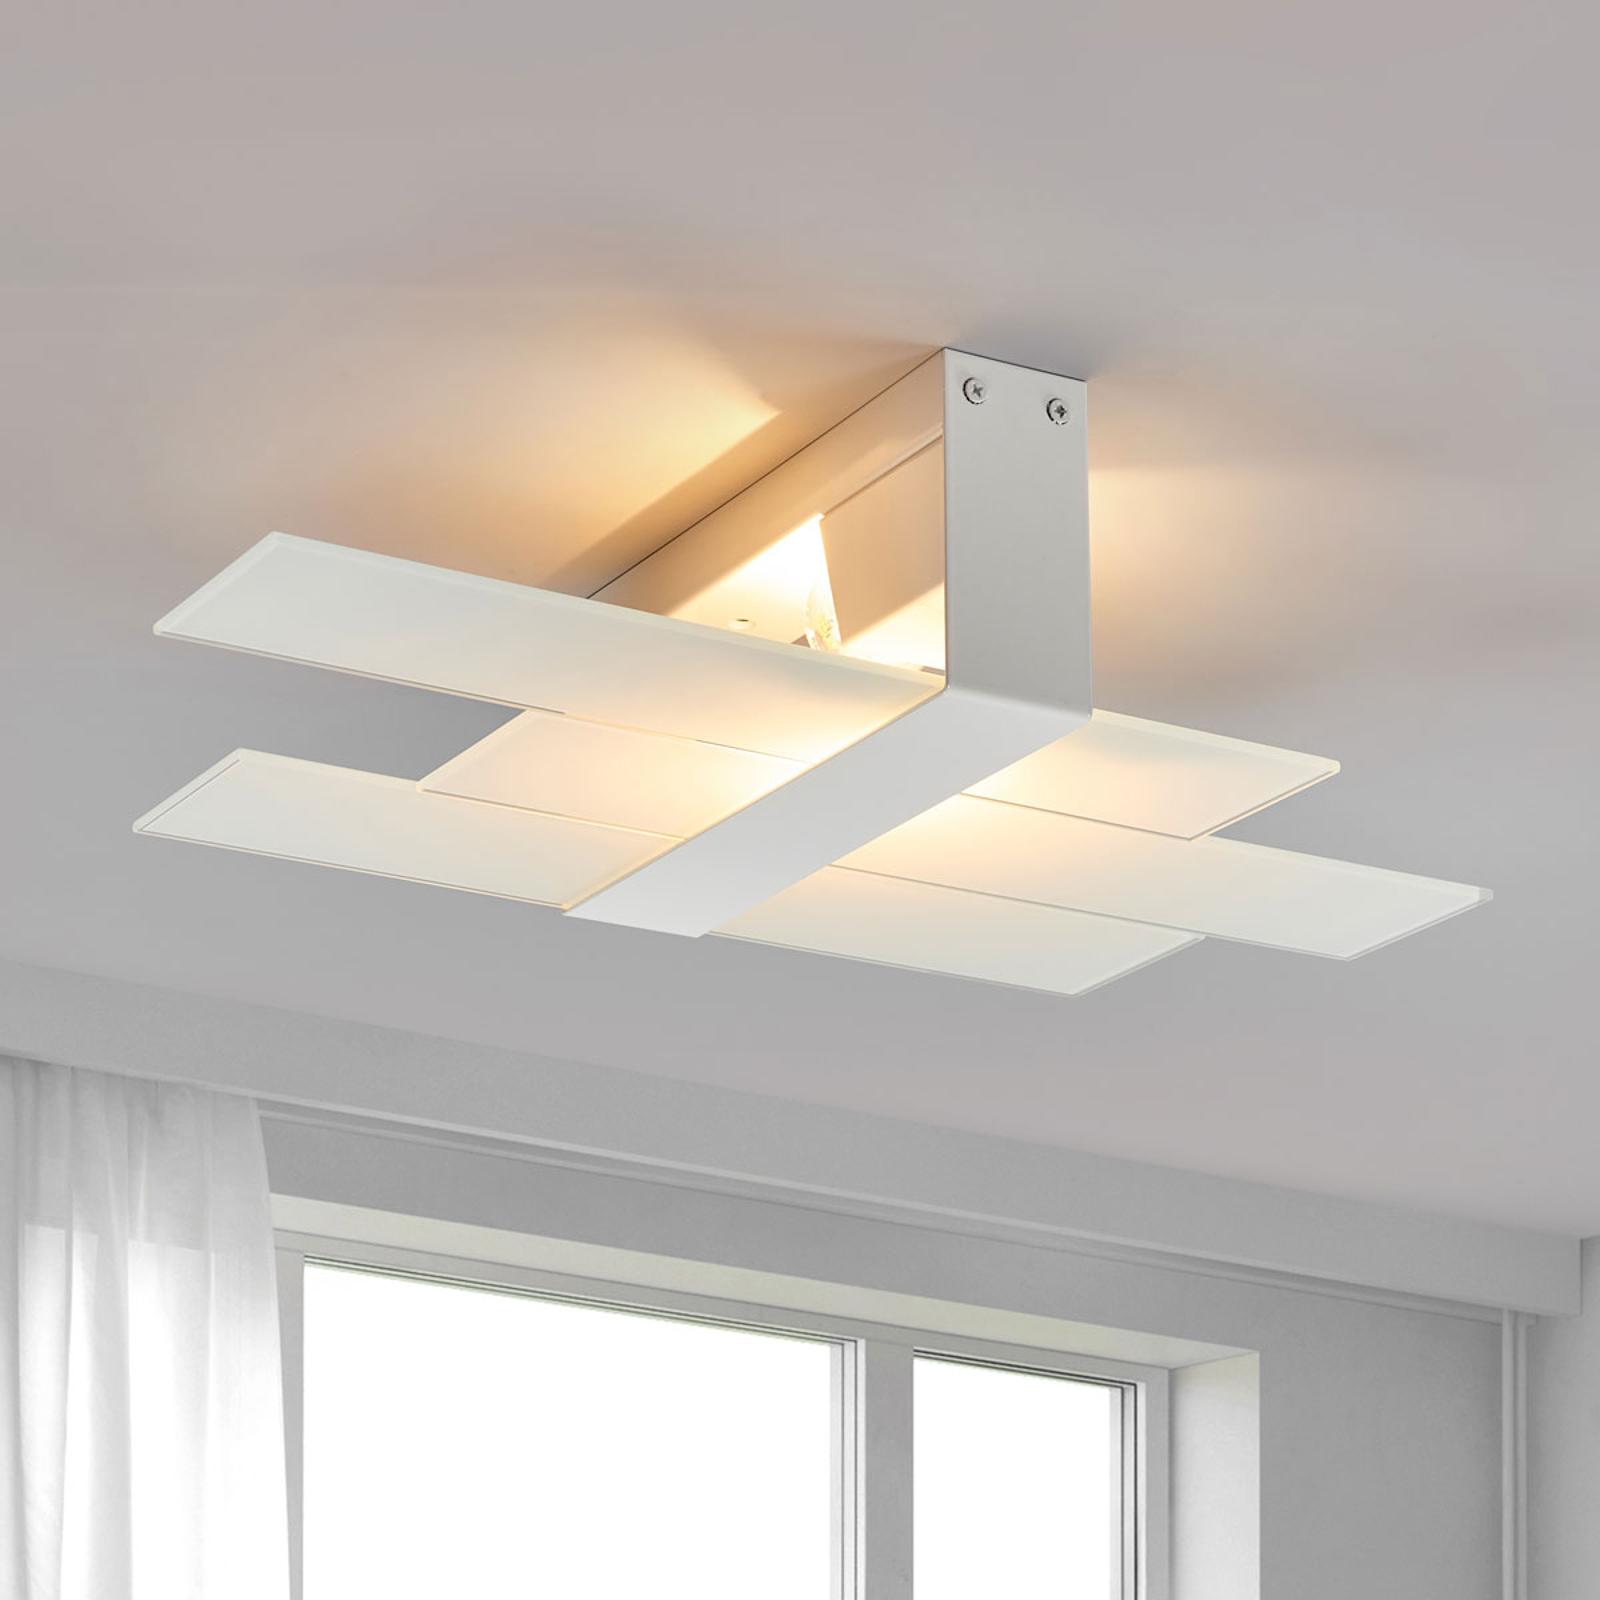 1-lichts moderne plafondlamp Triad